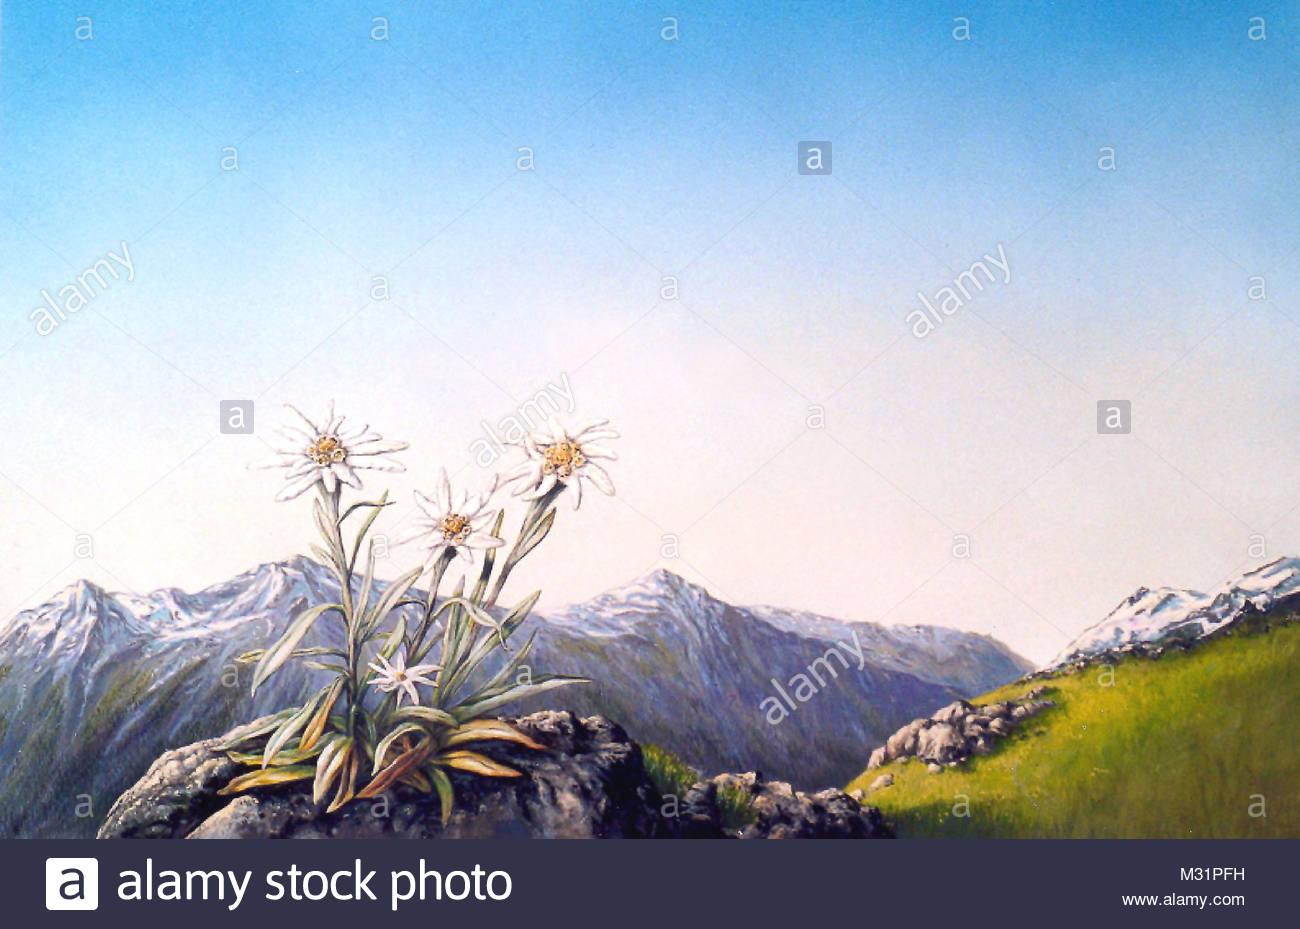 Habitat mountains Edelweiss - Stock Image